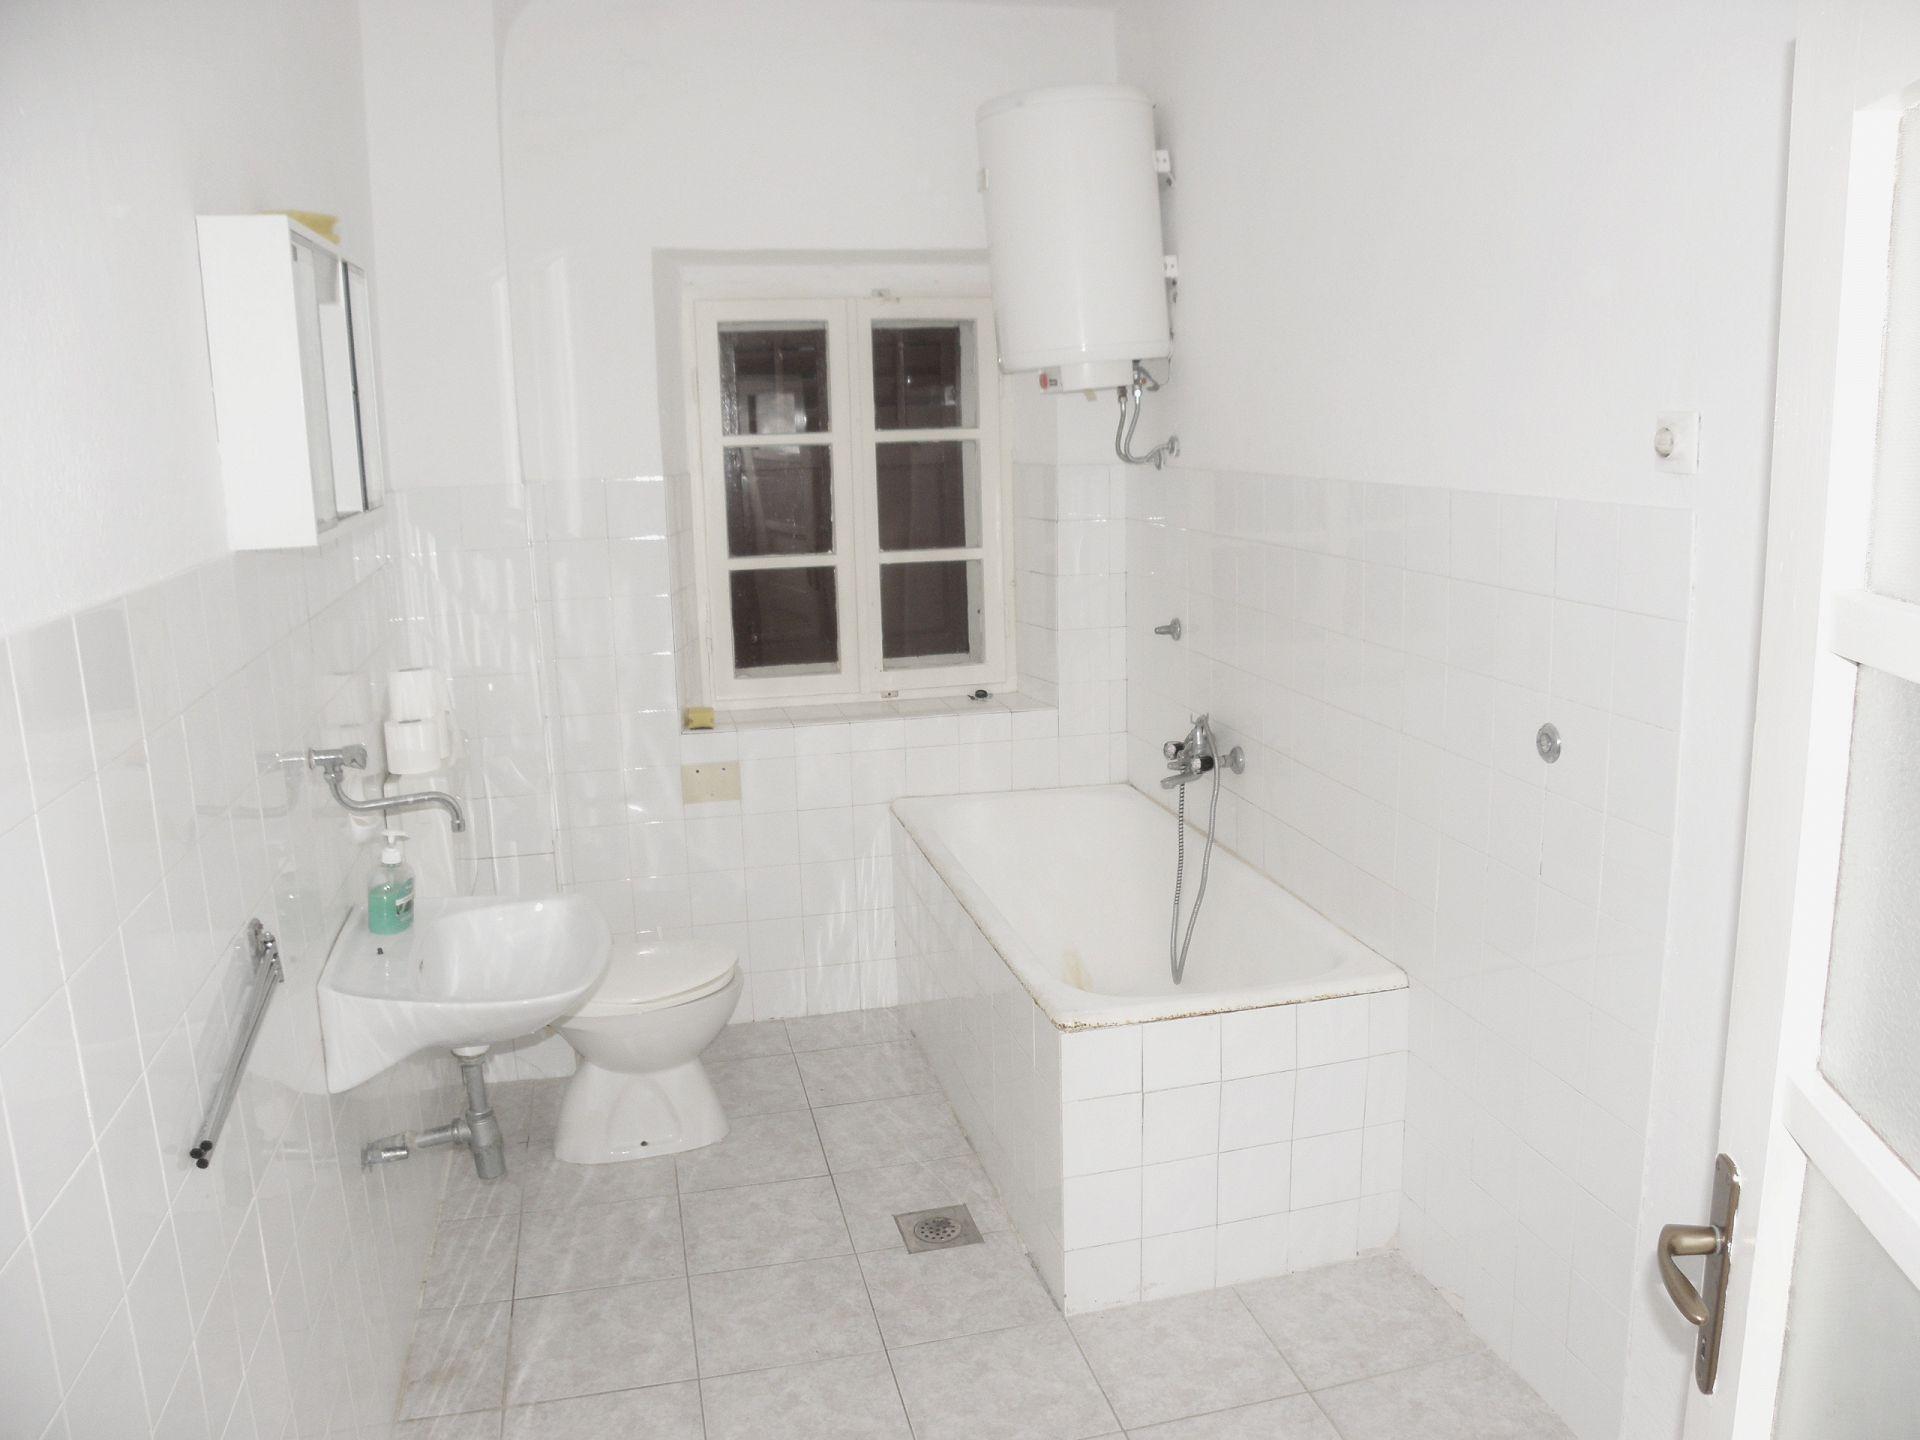 A3(2+2) bijeli: bathroom with toilet - Apartamenty  A3(2+2) bijeli 2902 - Wyspa Pag